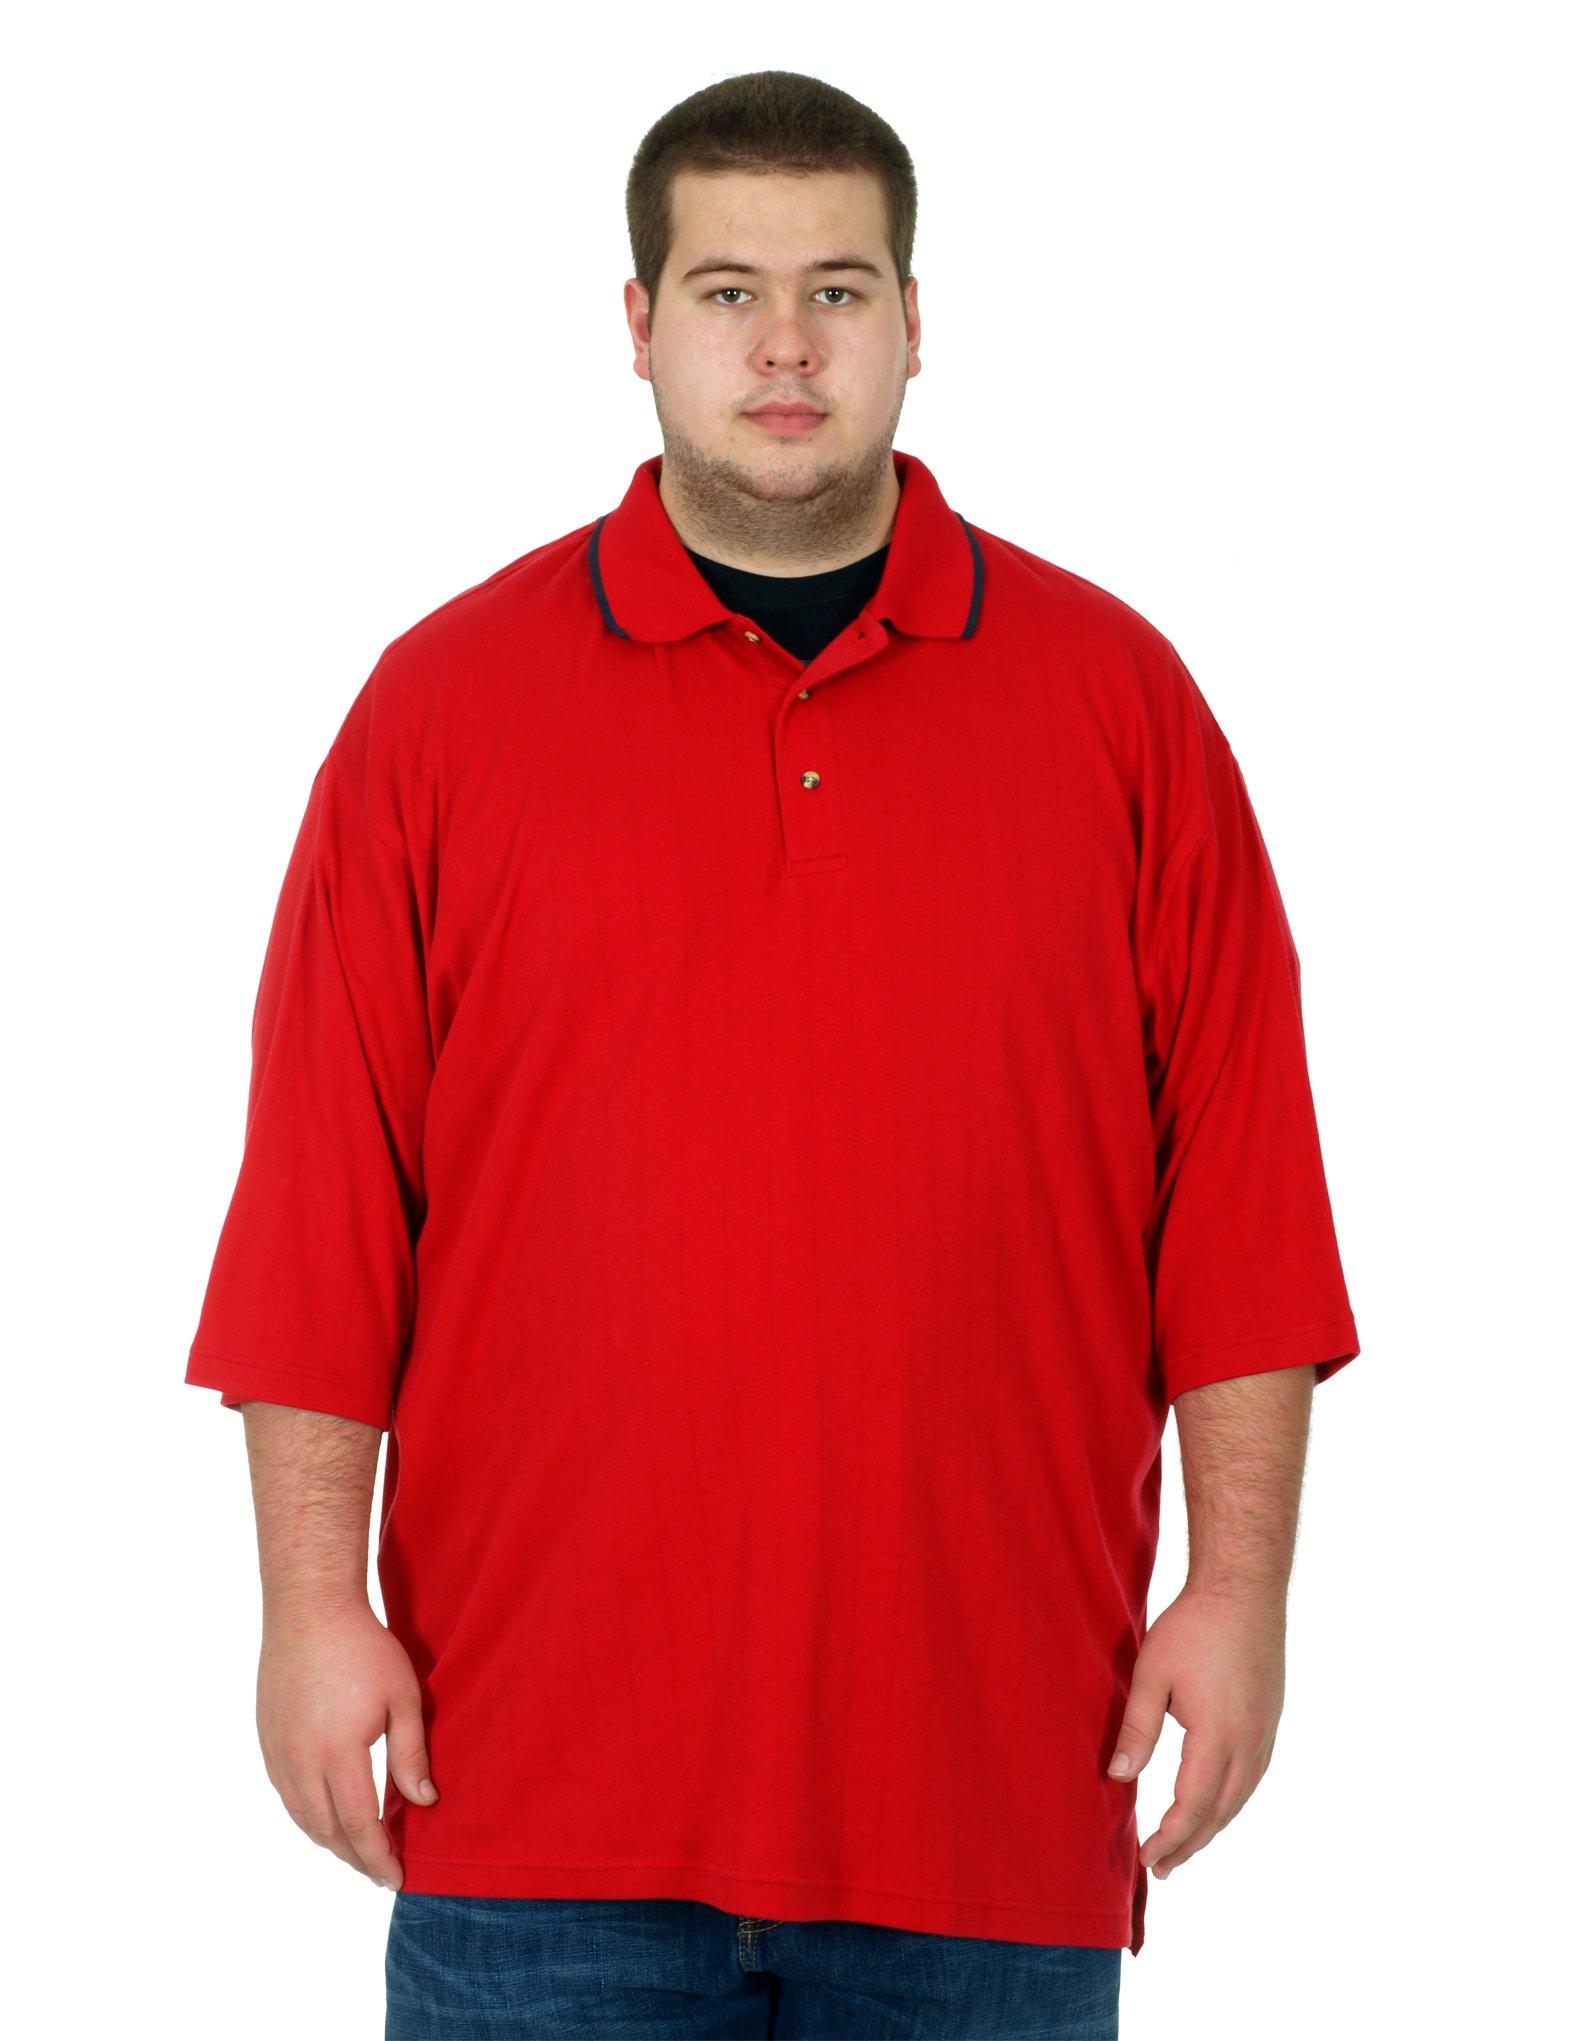 Tri-Mountain Men's Big & Tall Short Sleeve Polo Shirt (5XLT, Red-Navy)